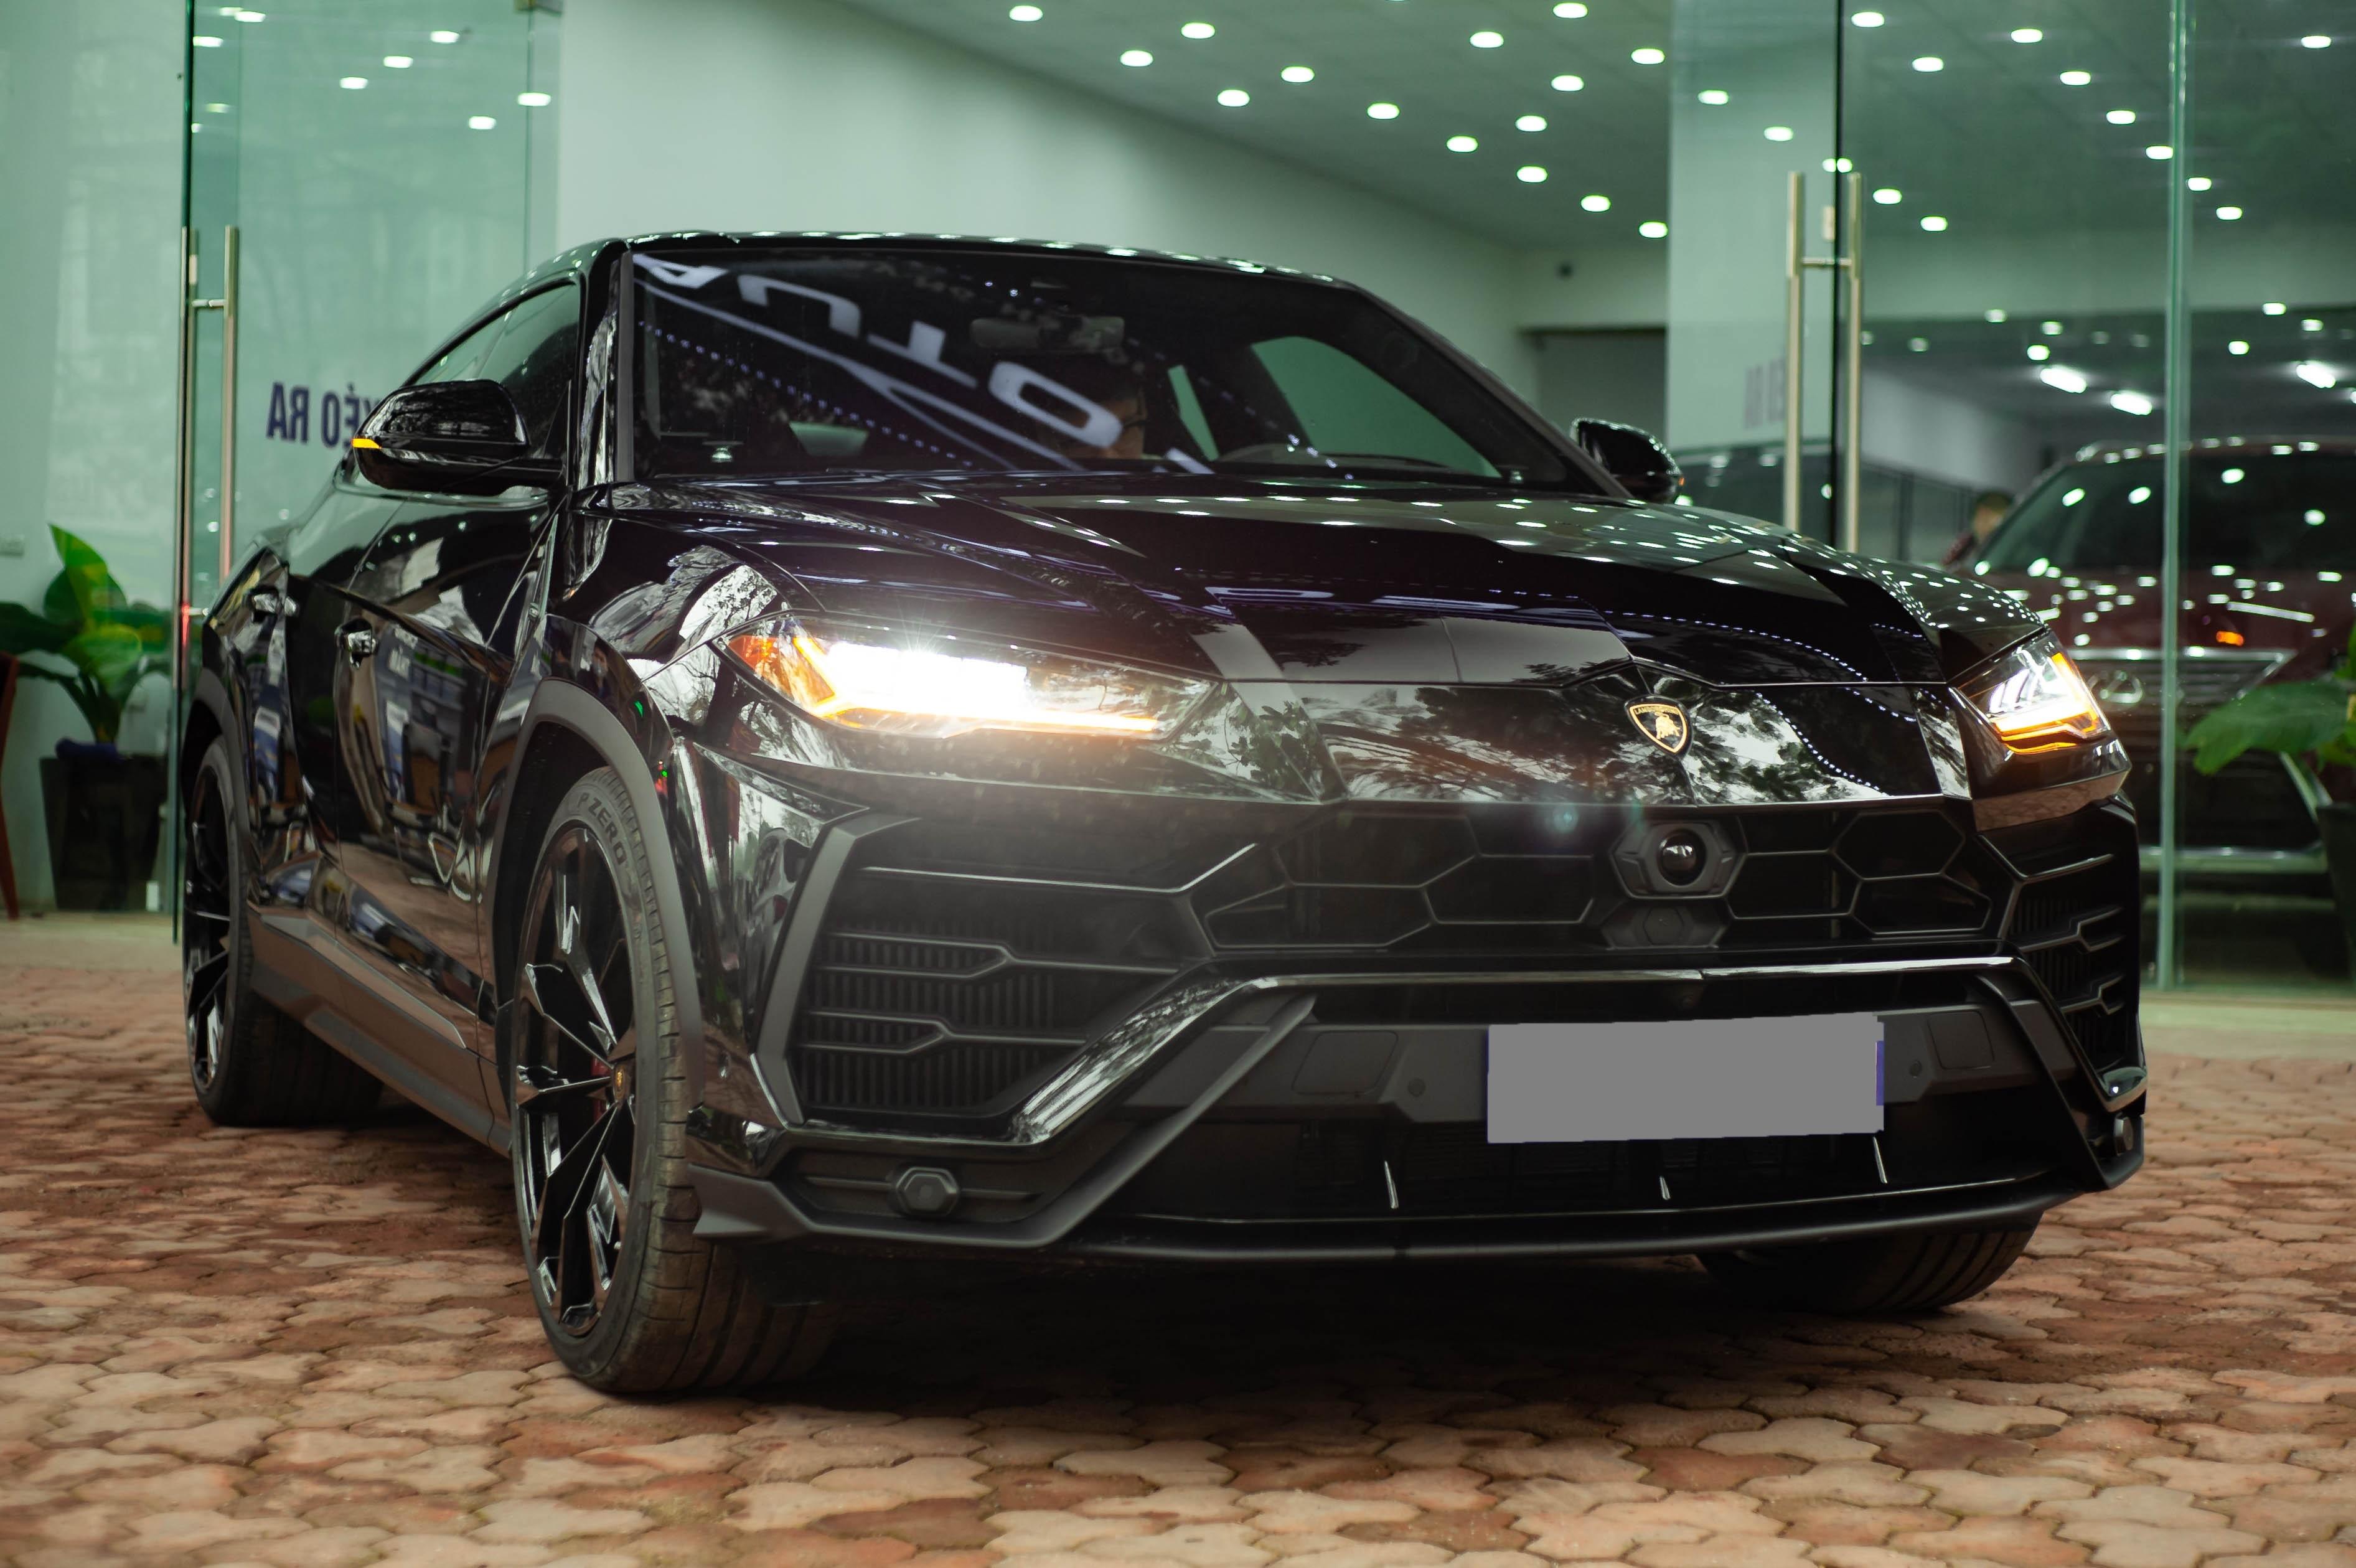 Ngam Lamborghini Urus mau den dau tien ve VN, gia khoang 1 trieu USD hinh anh 2 1_zing_15_.jpg